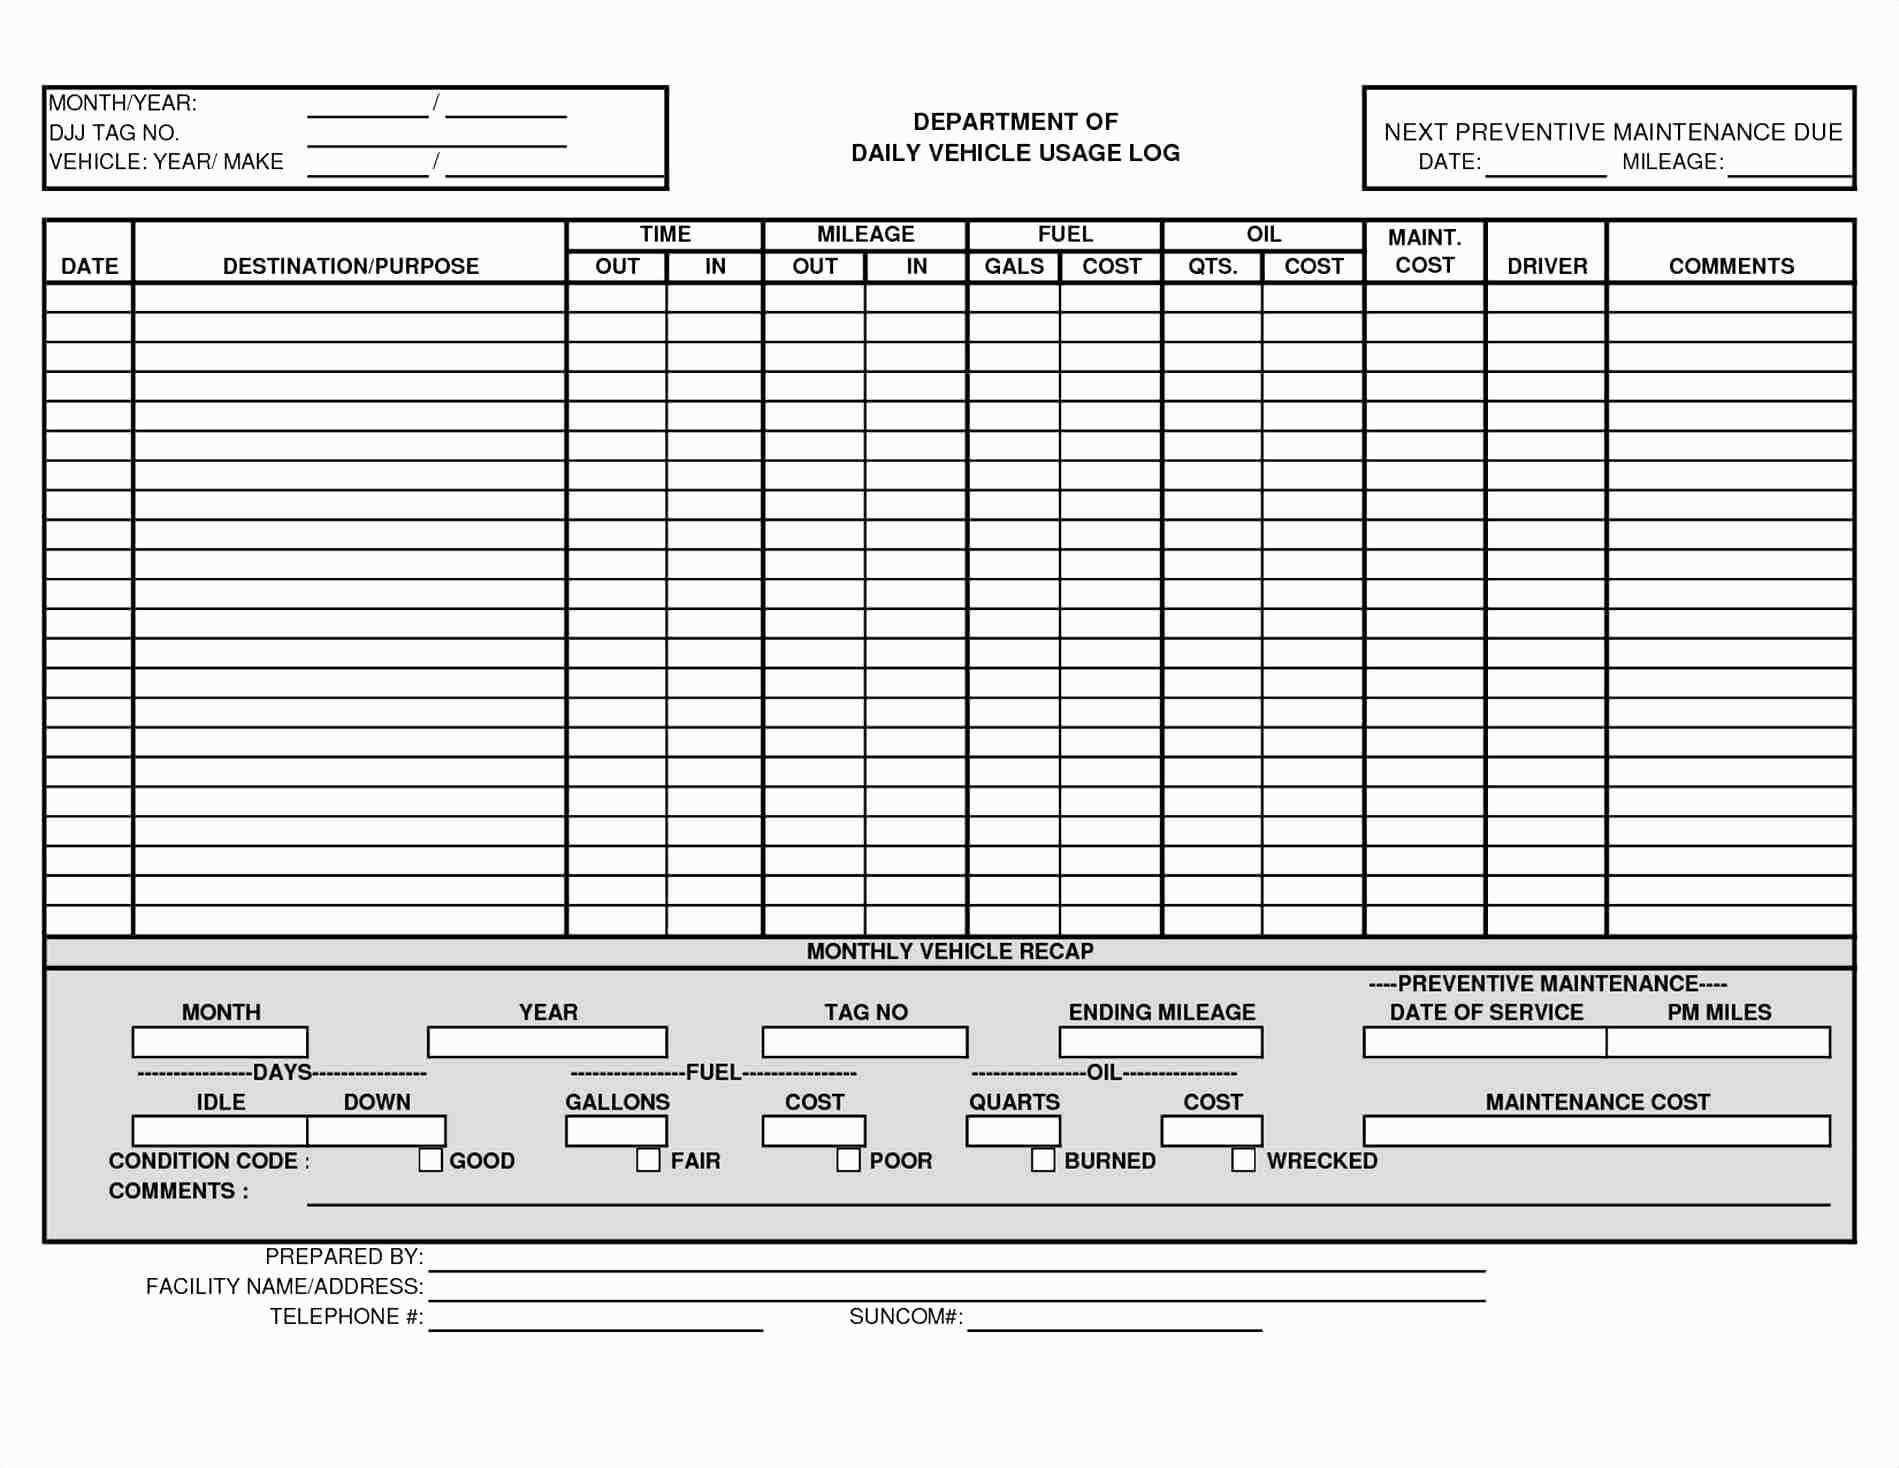 Schedule Template Driver Excel Vehicle Fleet Management Intended For Fleet Management Report Template